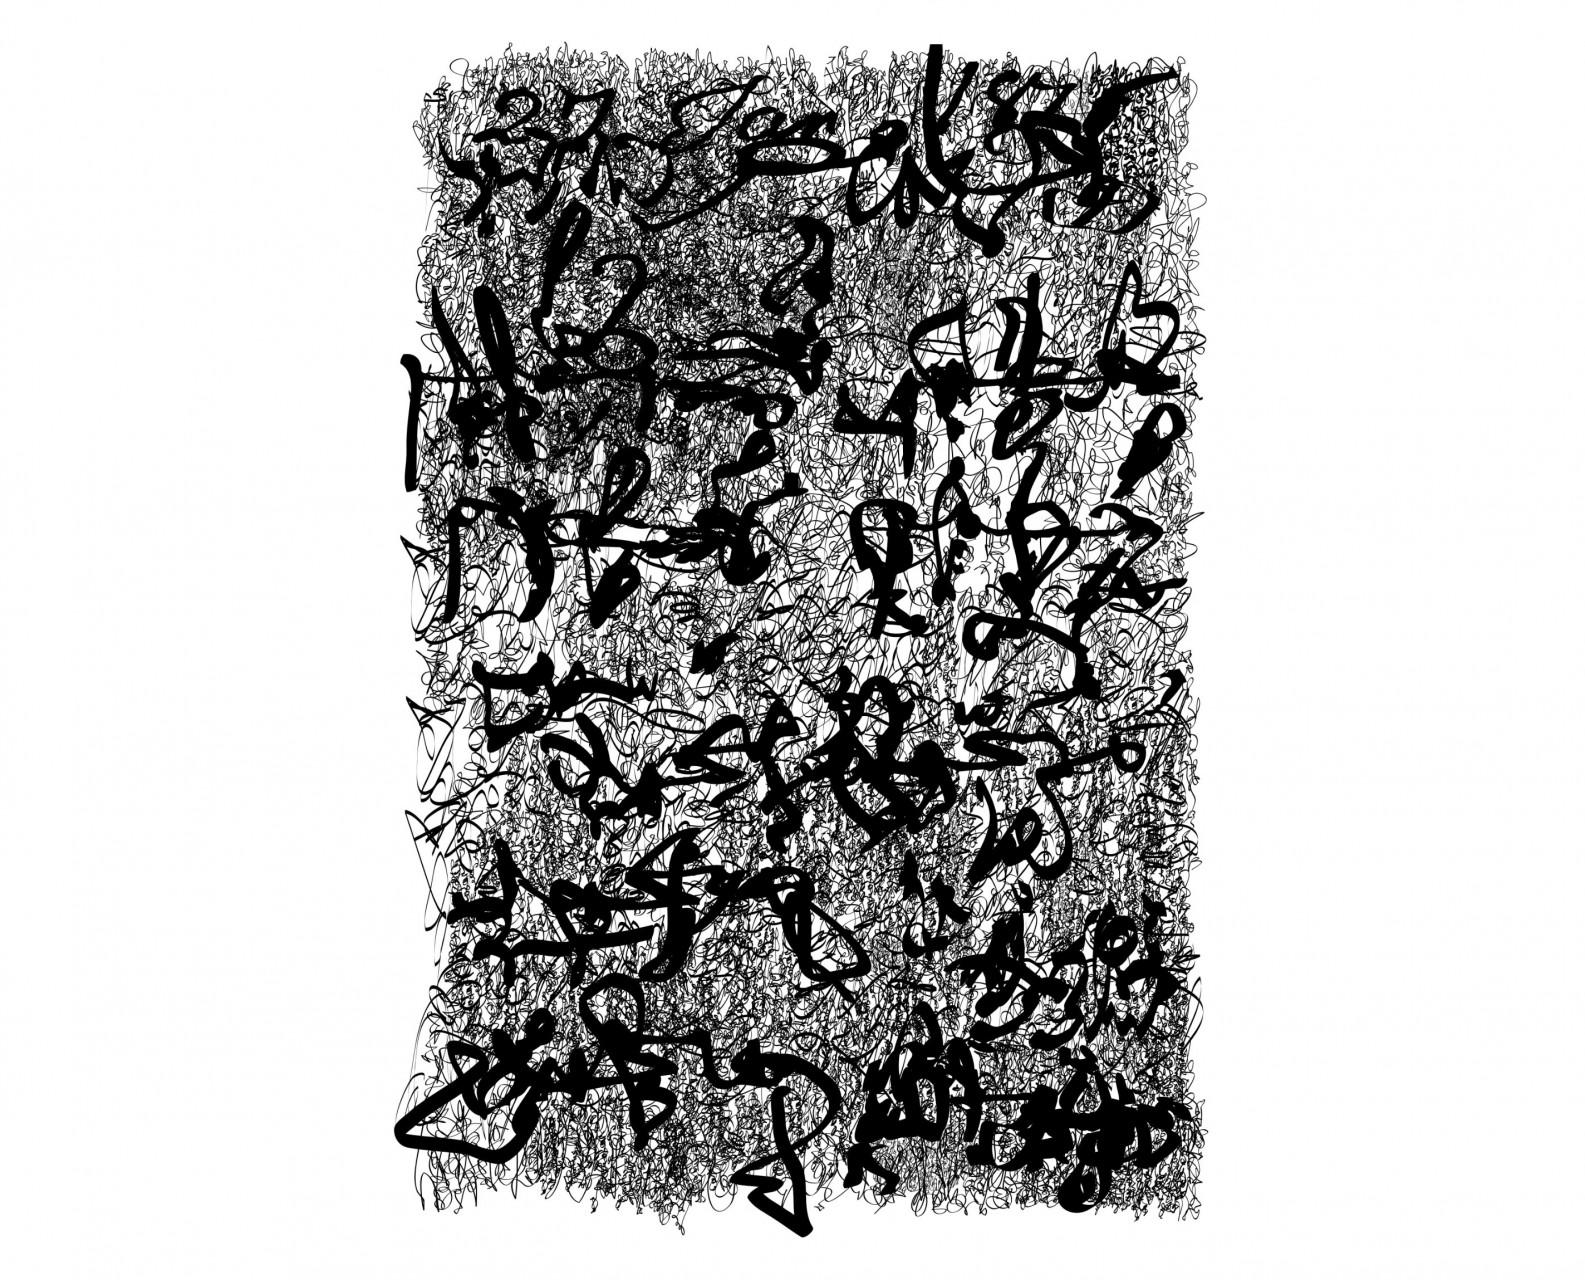 Palimpsest 012, Eco-Solvent Tinte auf LKW-Plane, 137 x 205 cm, 2017